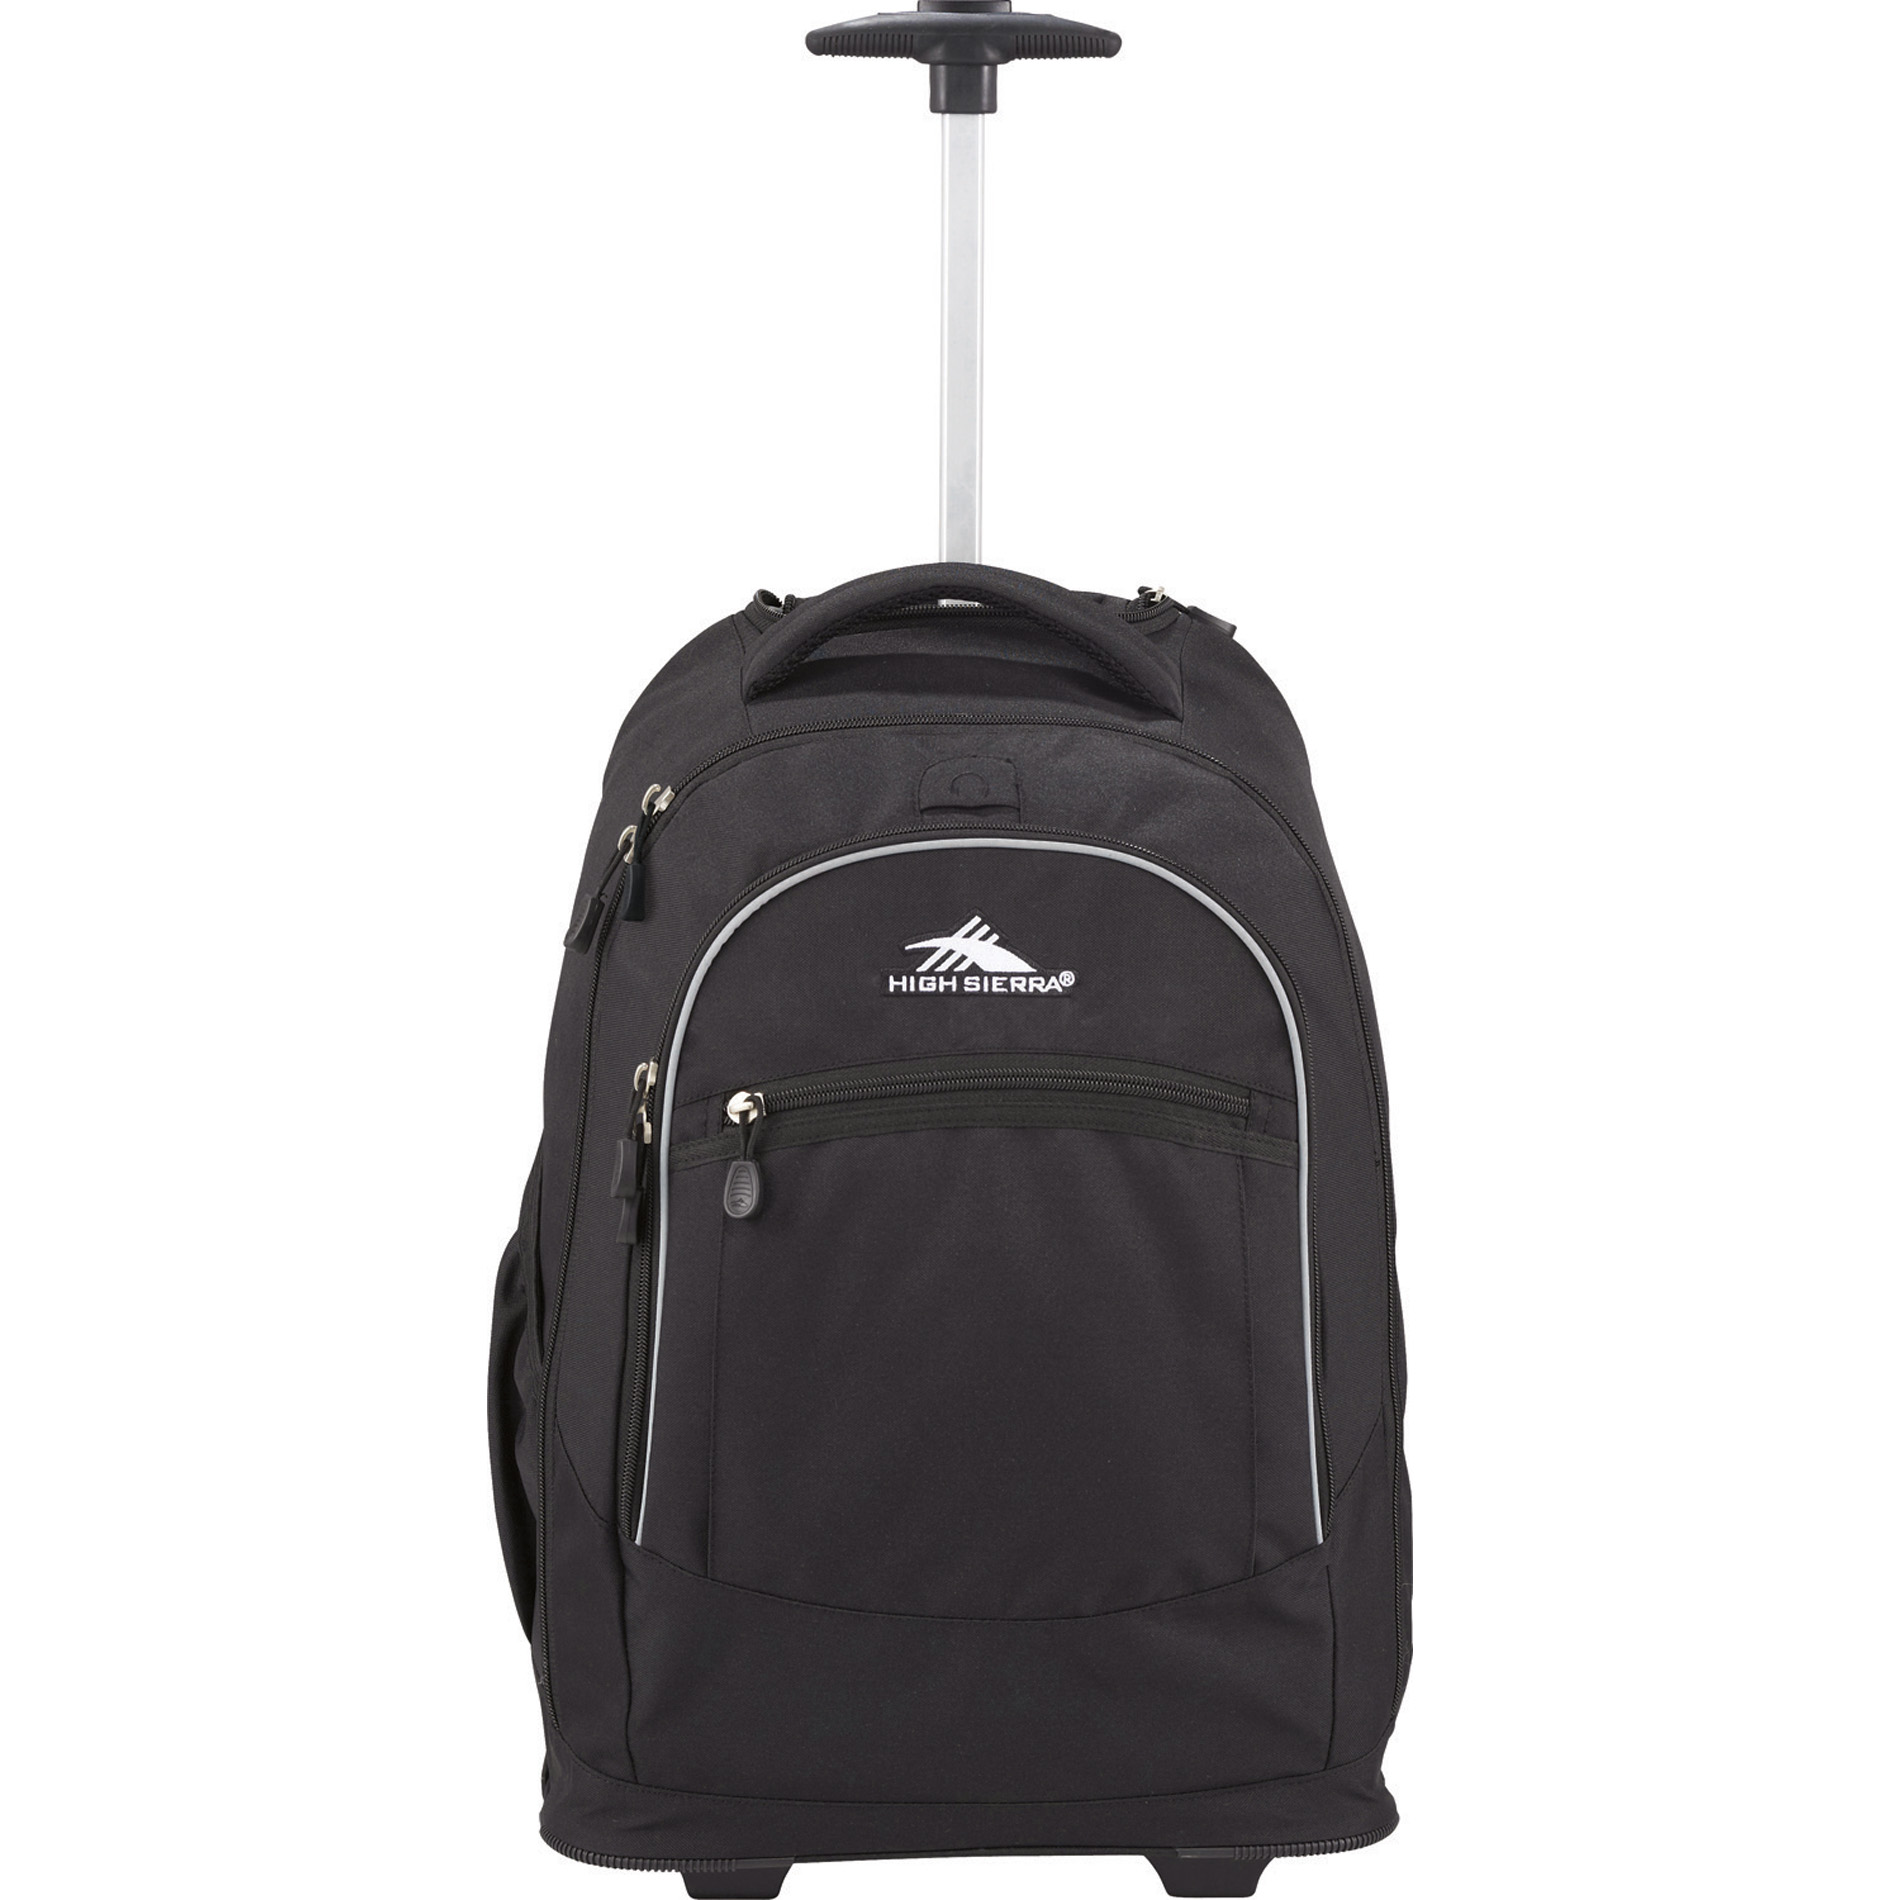 High Sierra 8051-37 - Chaser Wheeled 17 Computer Backpack